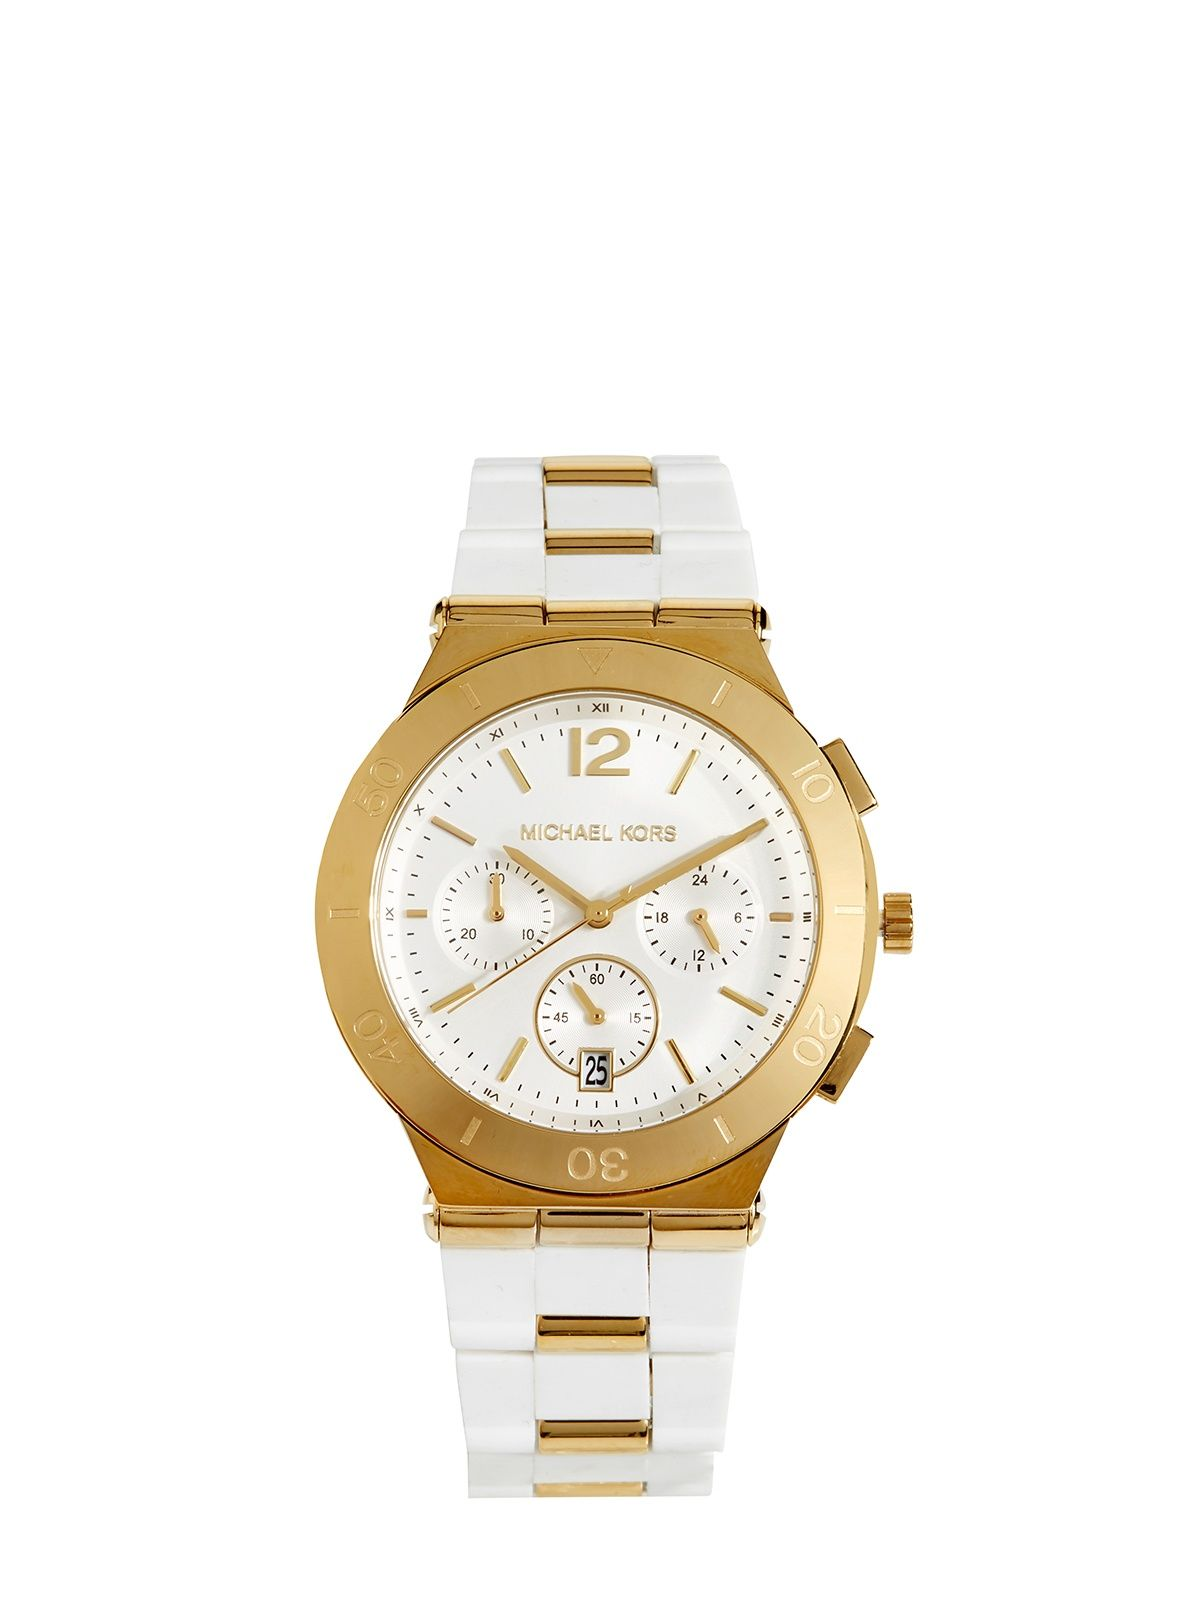 01c7e9476a5e Michael Kors Uhr MK 6171 weiss 159€   Fashionesta Online Shop ...